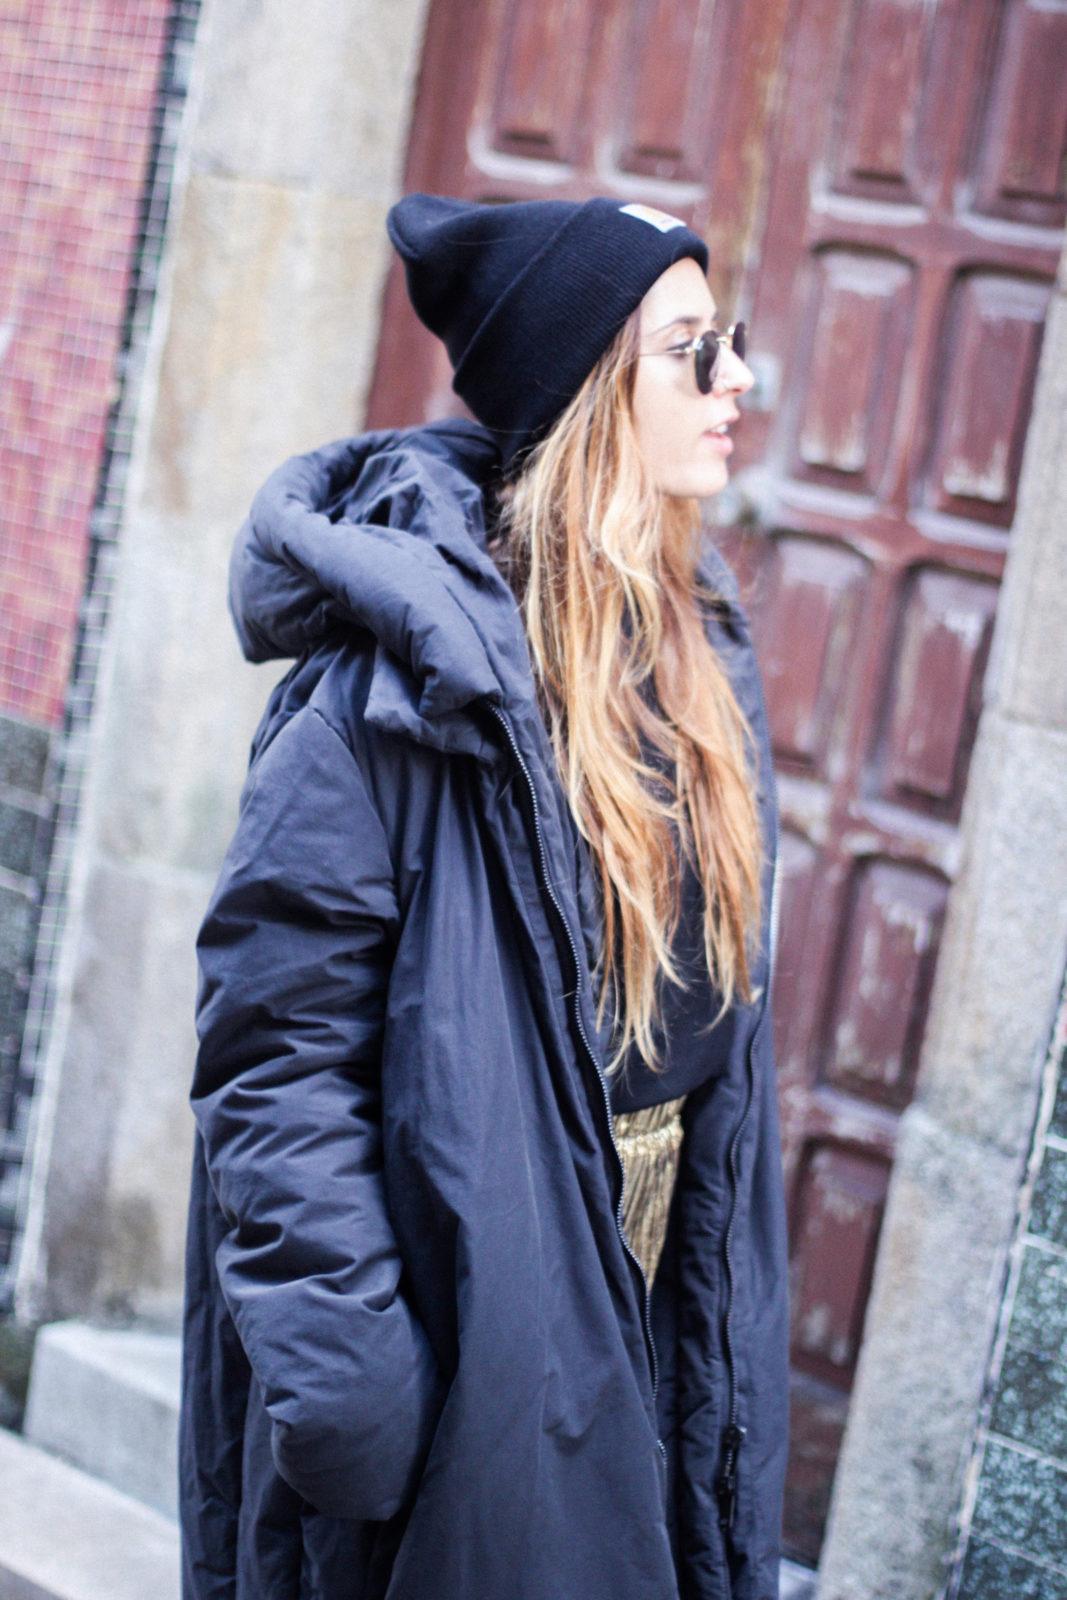 puffer_coat_plumifero_maxi_abrigo_calcetines_rejilla_falda_midi_metalizados_beanie_choker_vans-15